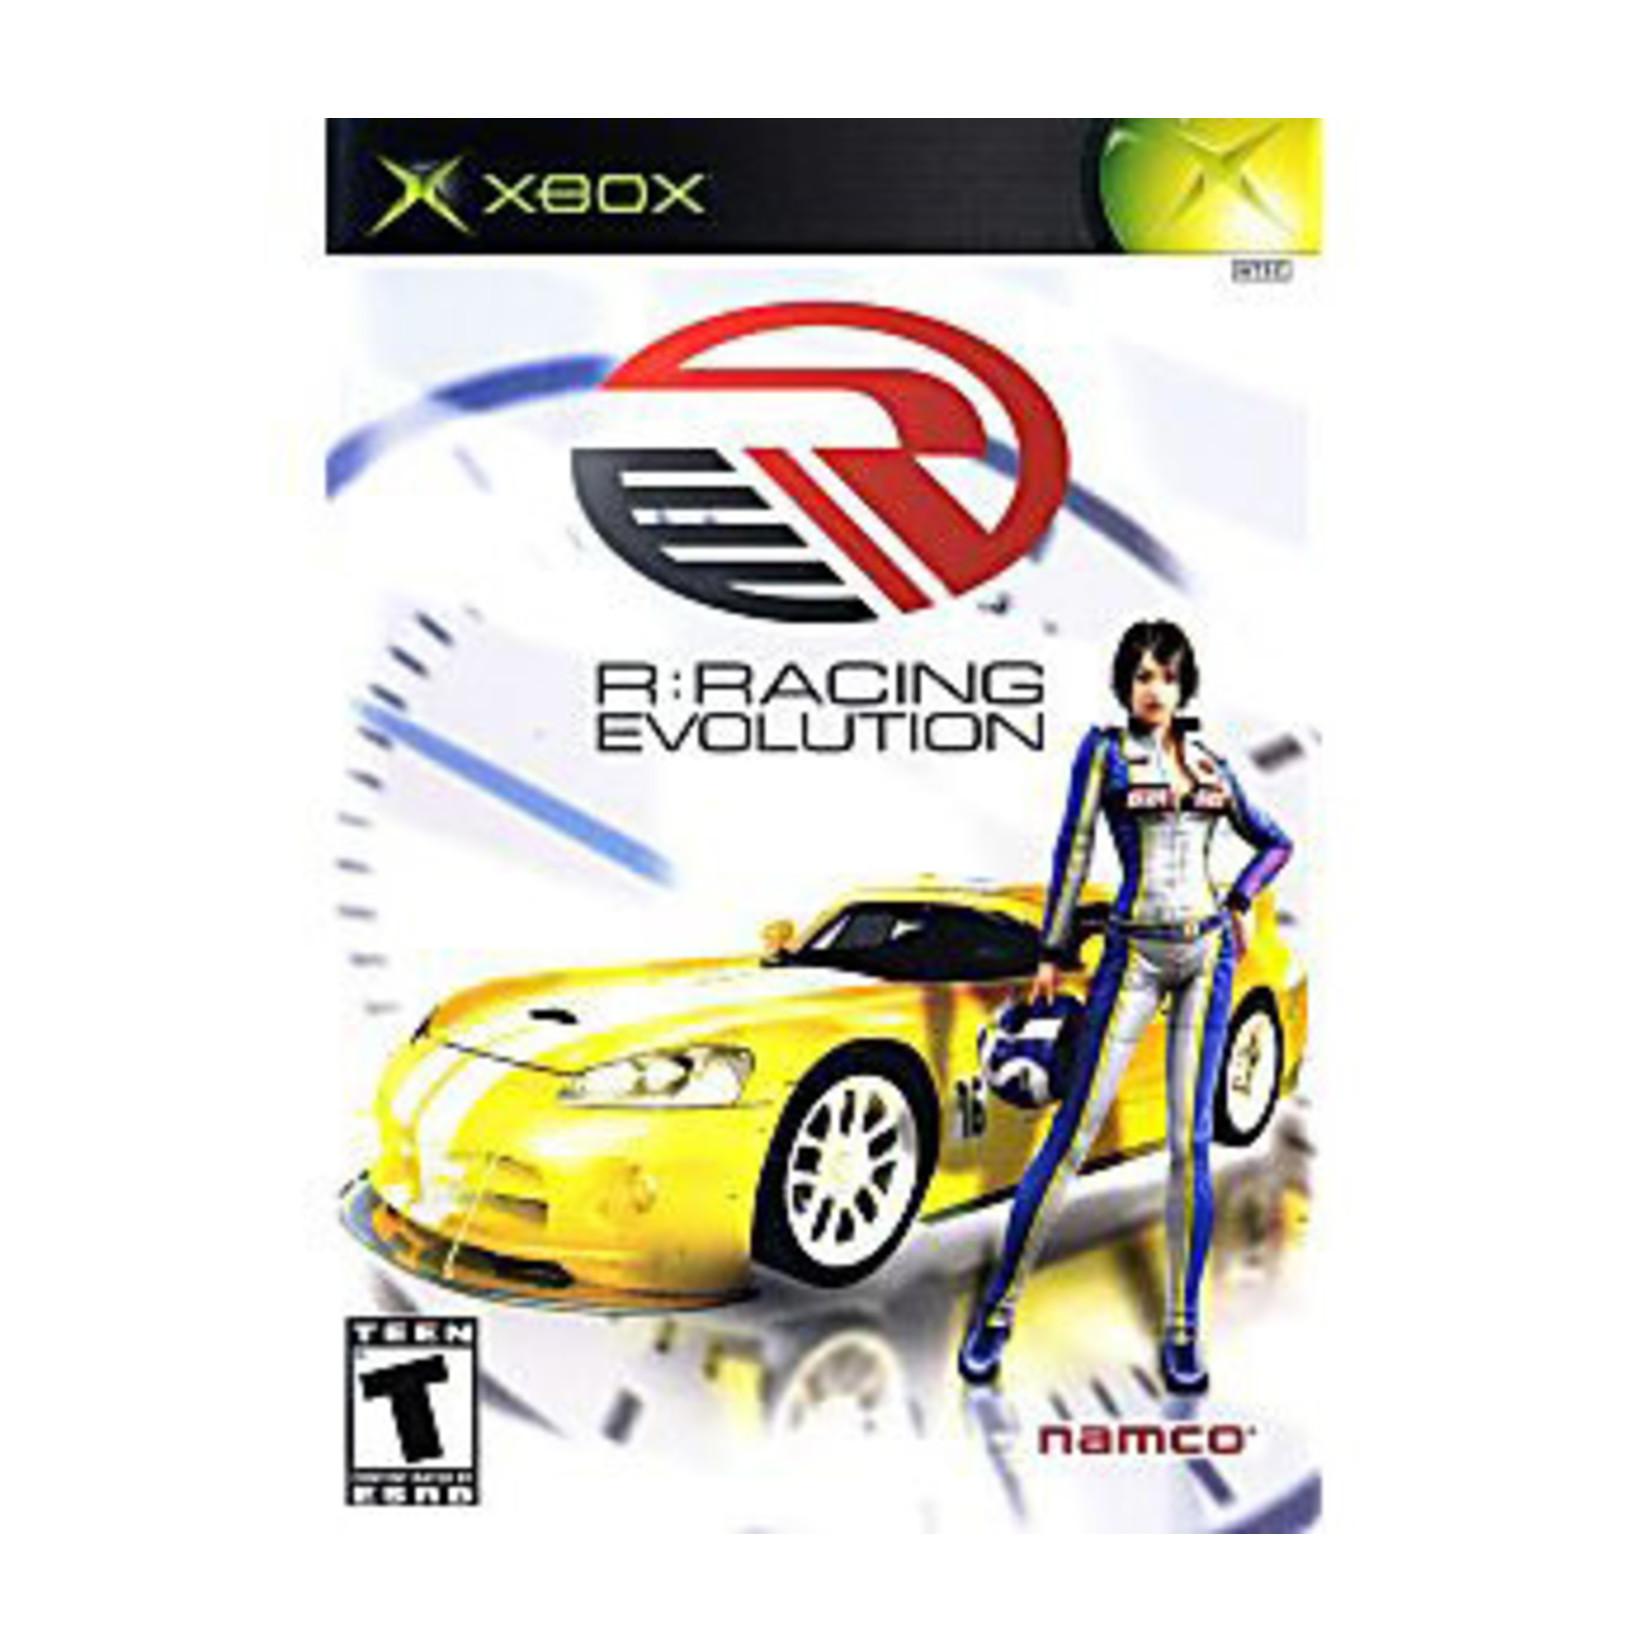 XBU-R: RACING EVOLUTION